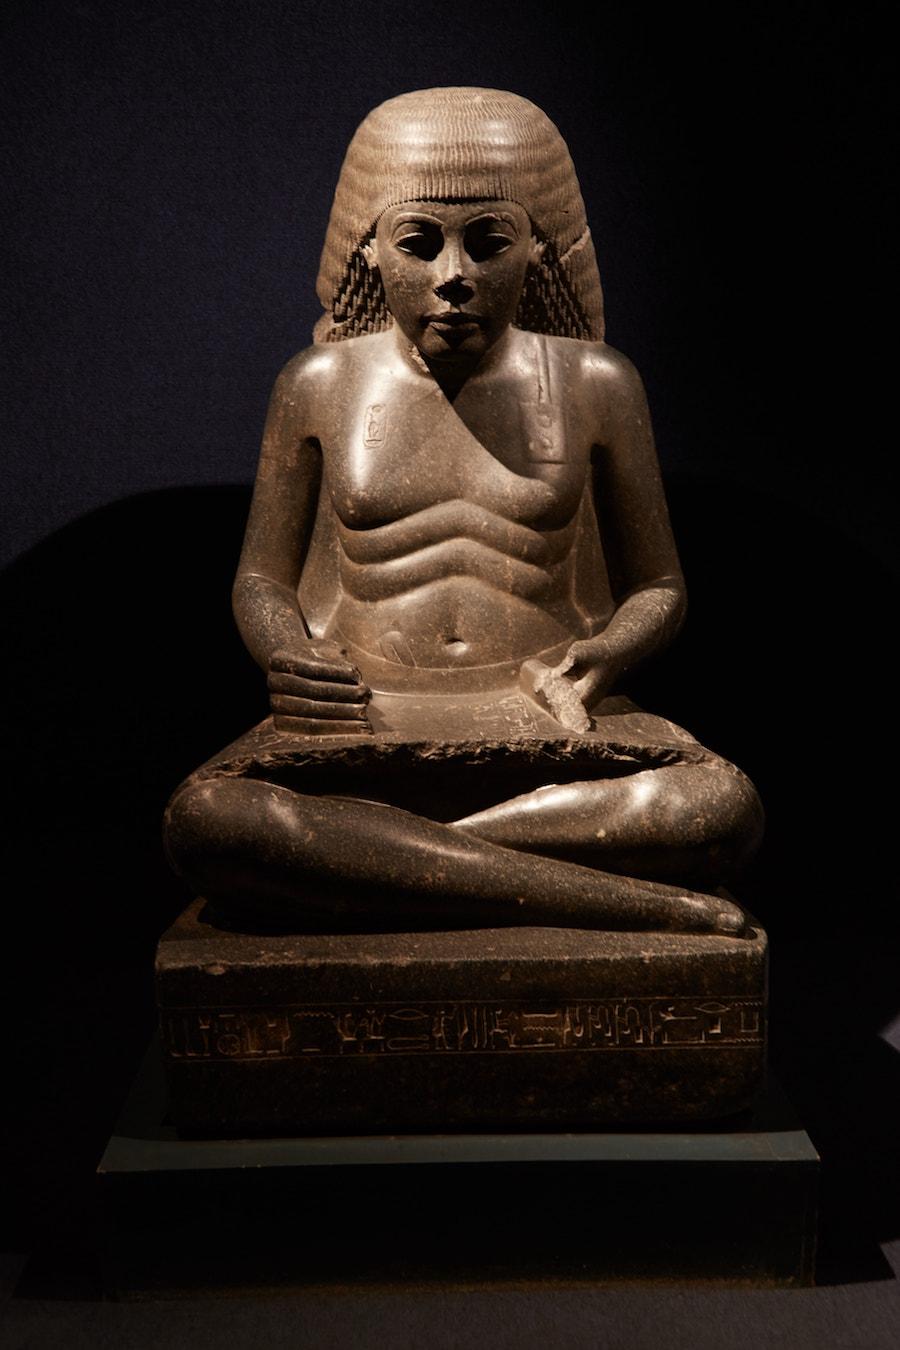 Amenhotep Son of Hapu